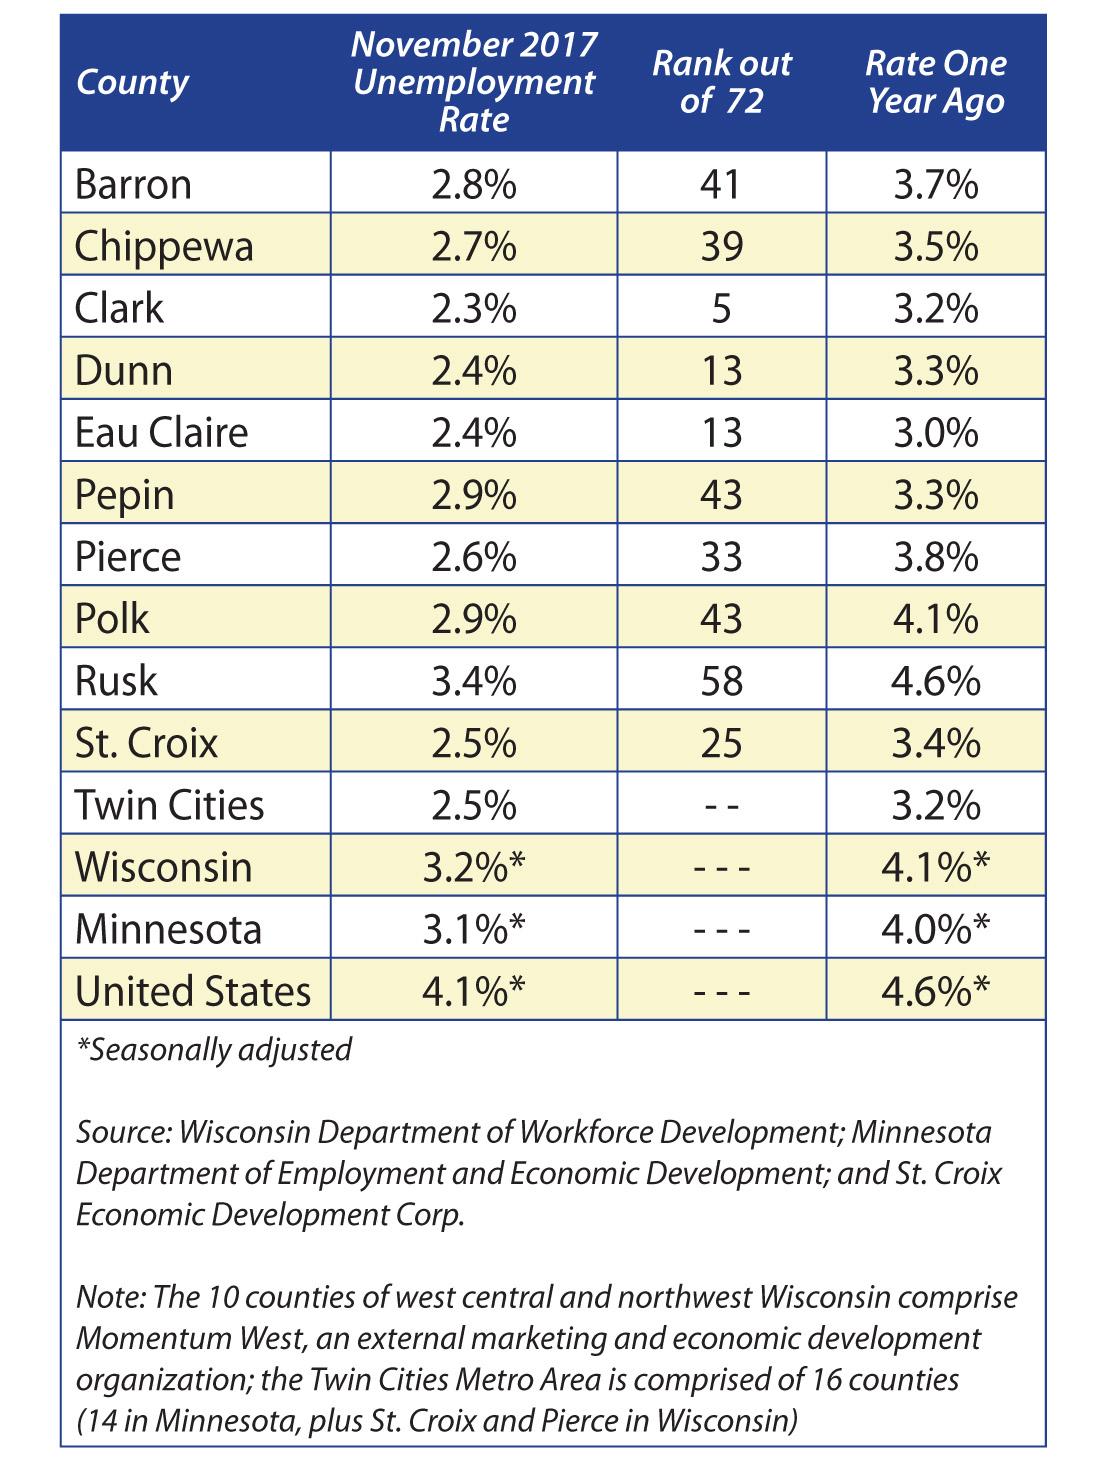 November 2017 Unemployment Table